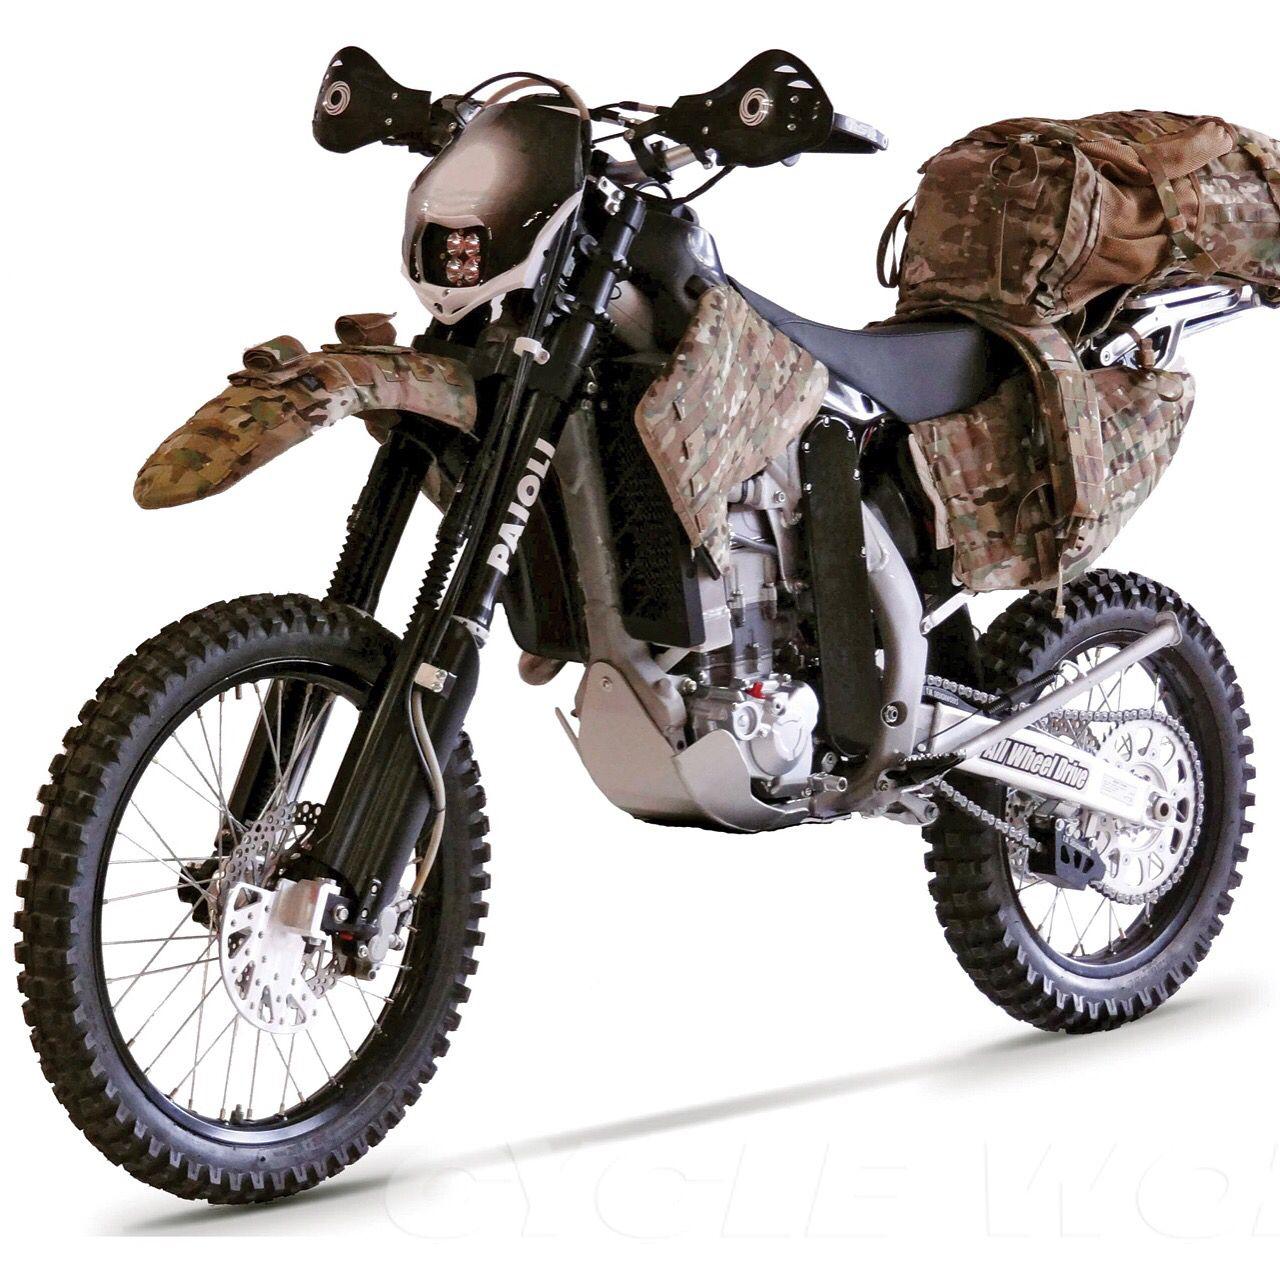 CHRISTINI AWD 450 Explorer Motorcycle, Dirtbikes